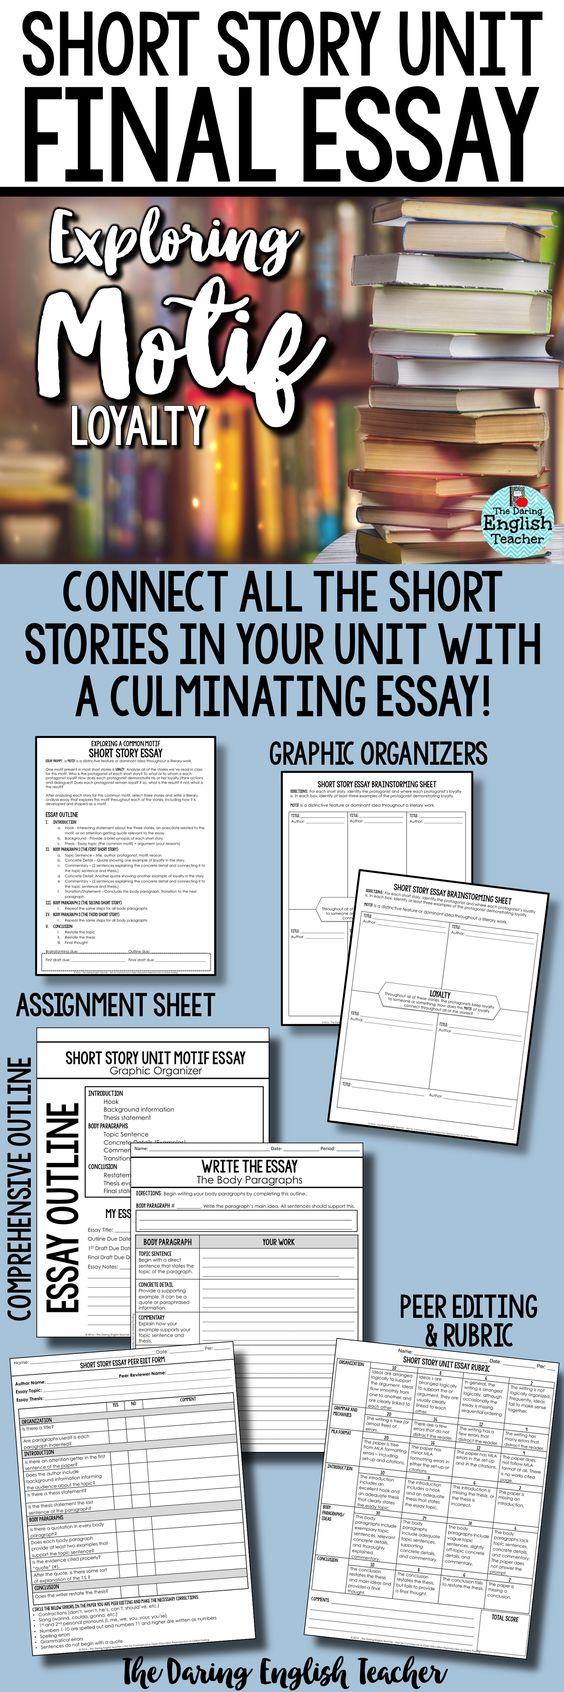 short story unit final essay analyzing motif loyalty